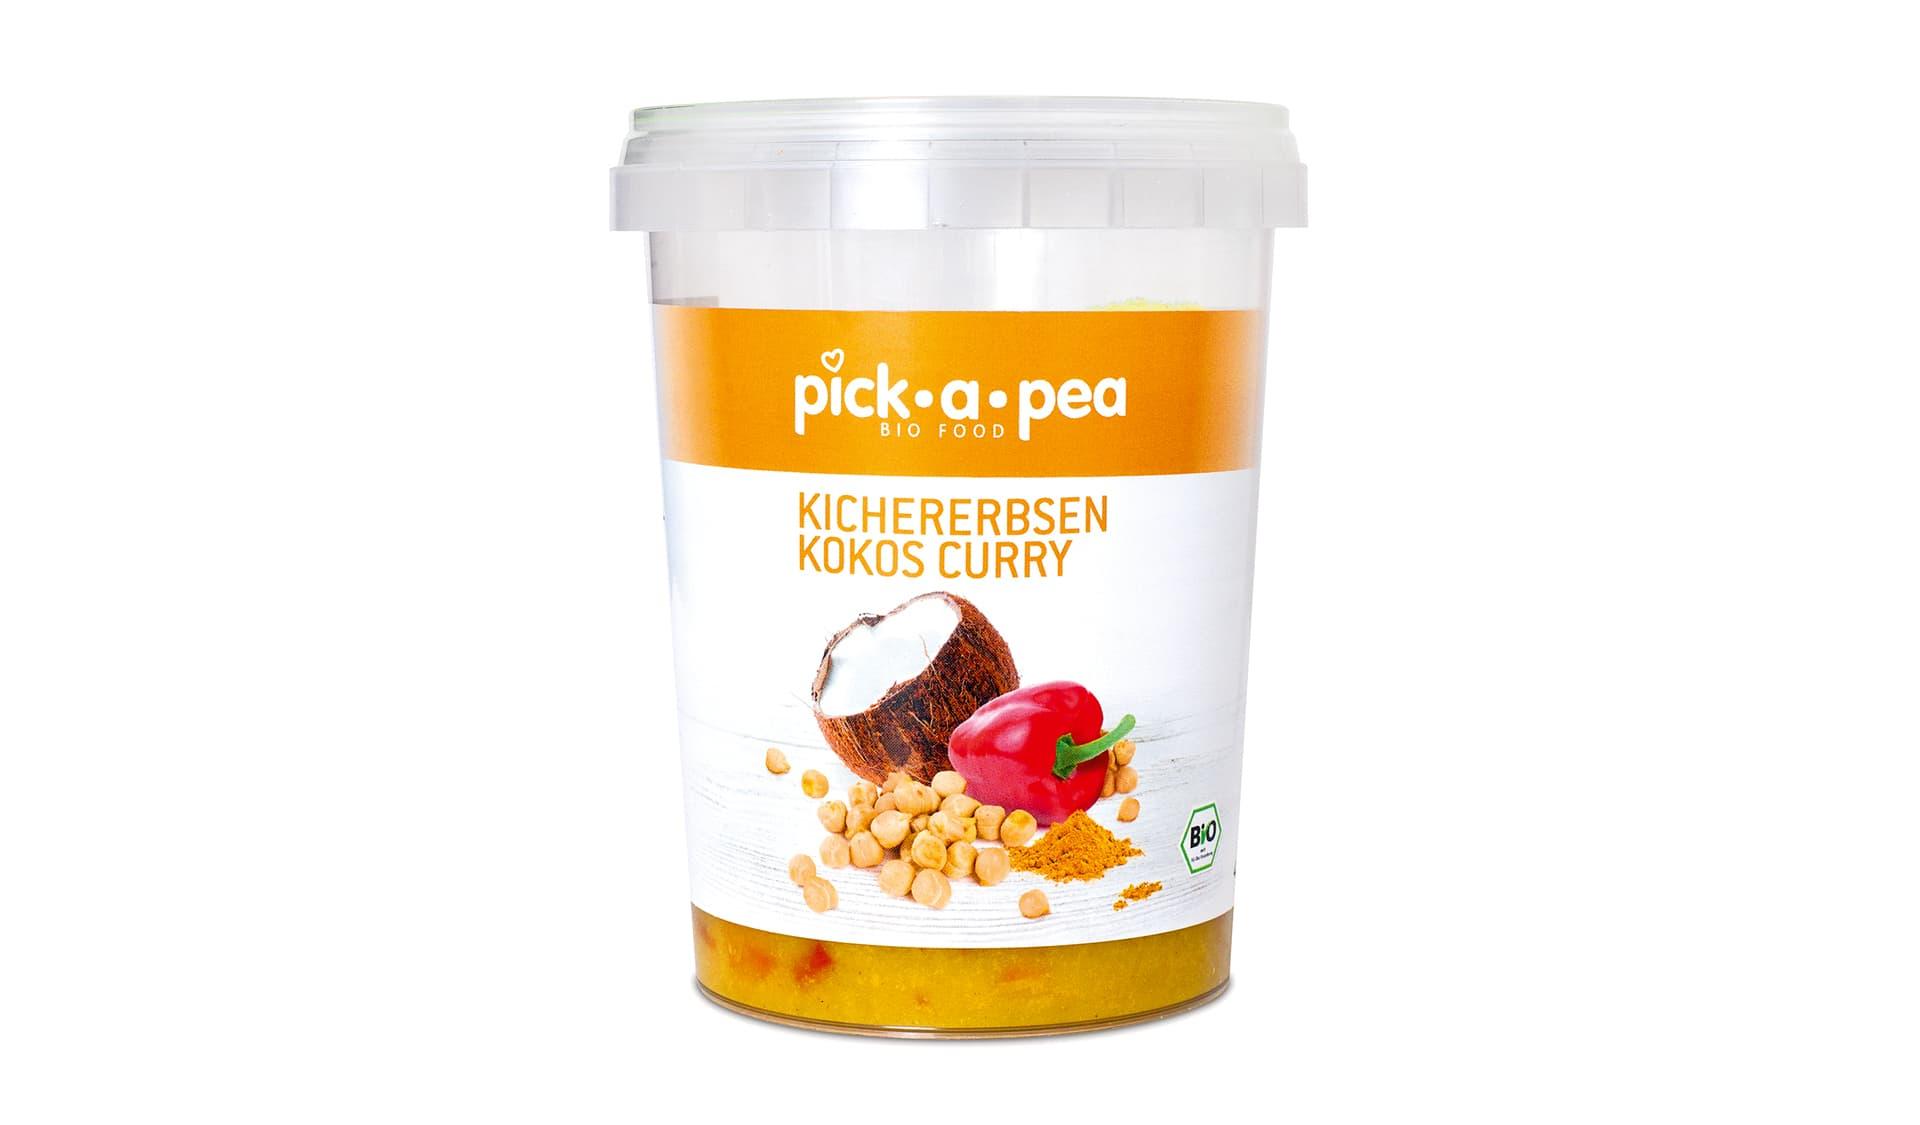 pick-a-pea Kichererbsen Kokos Curry (www.pick-a-pea.com)